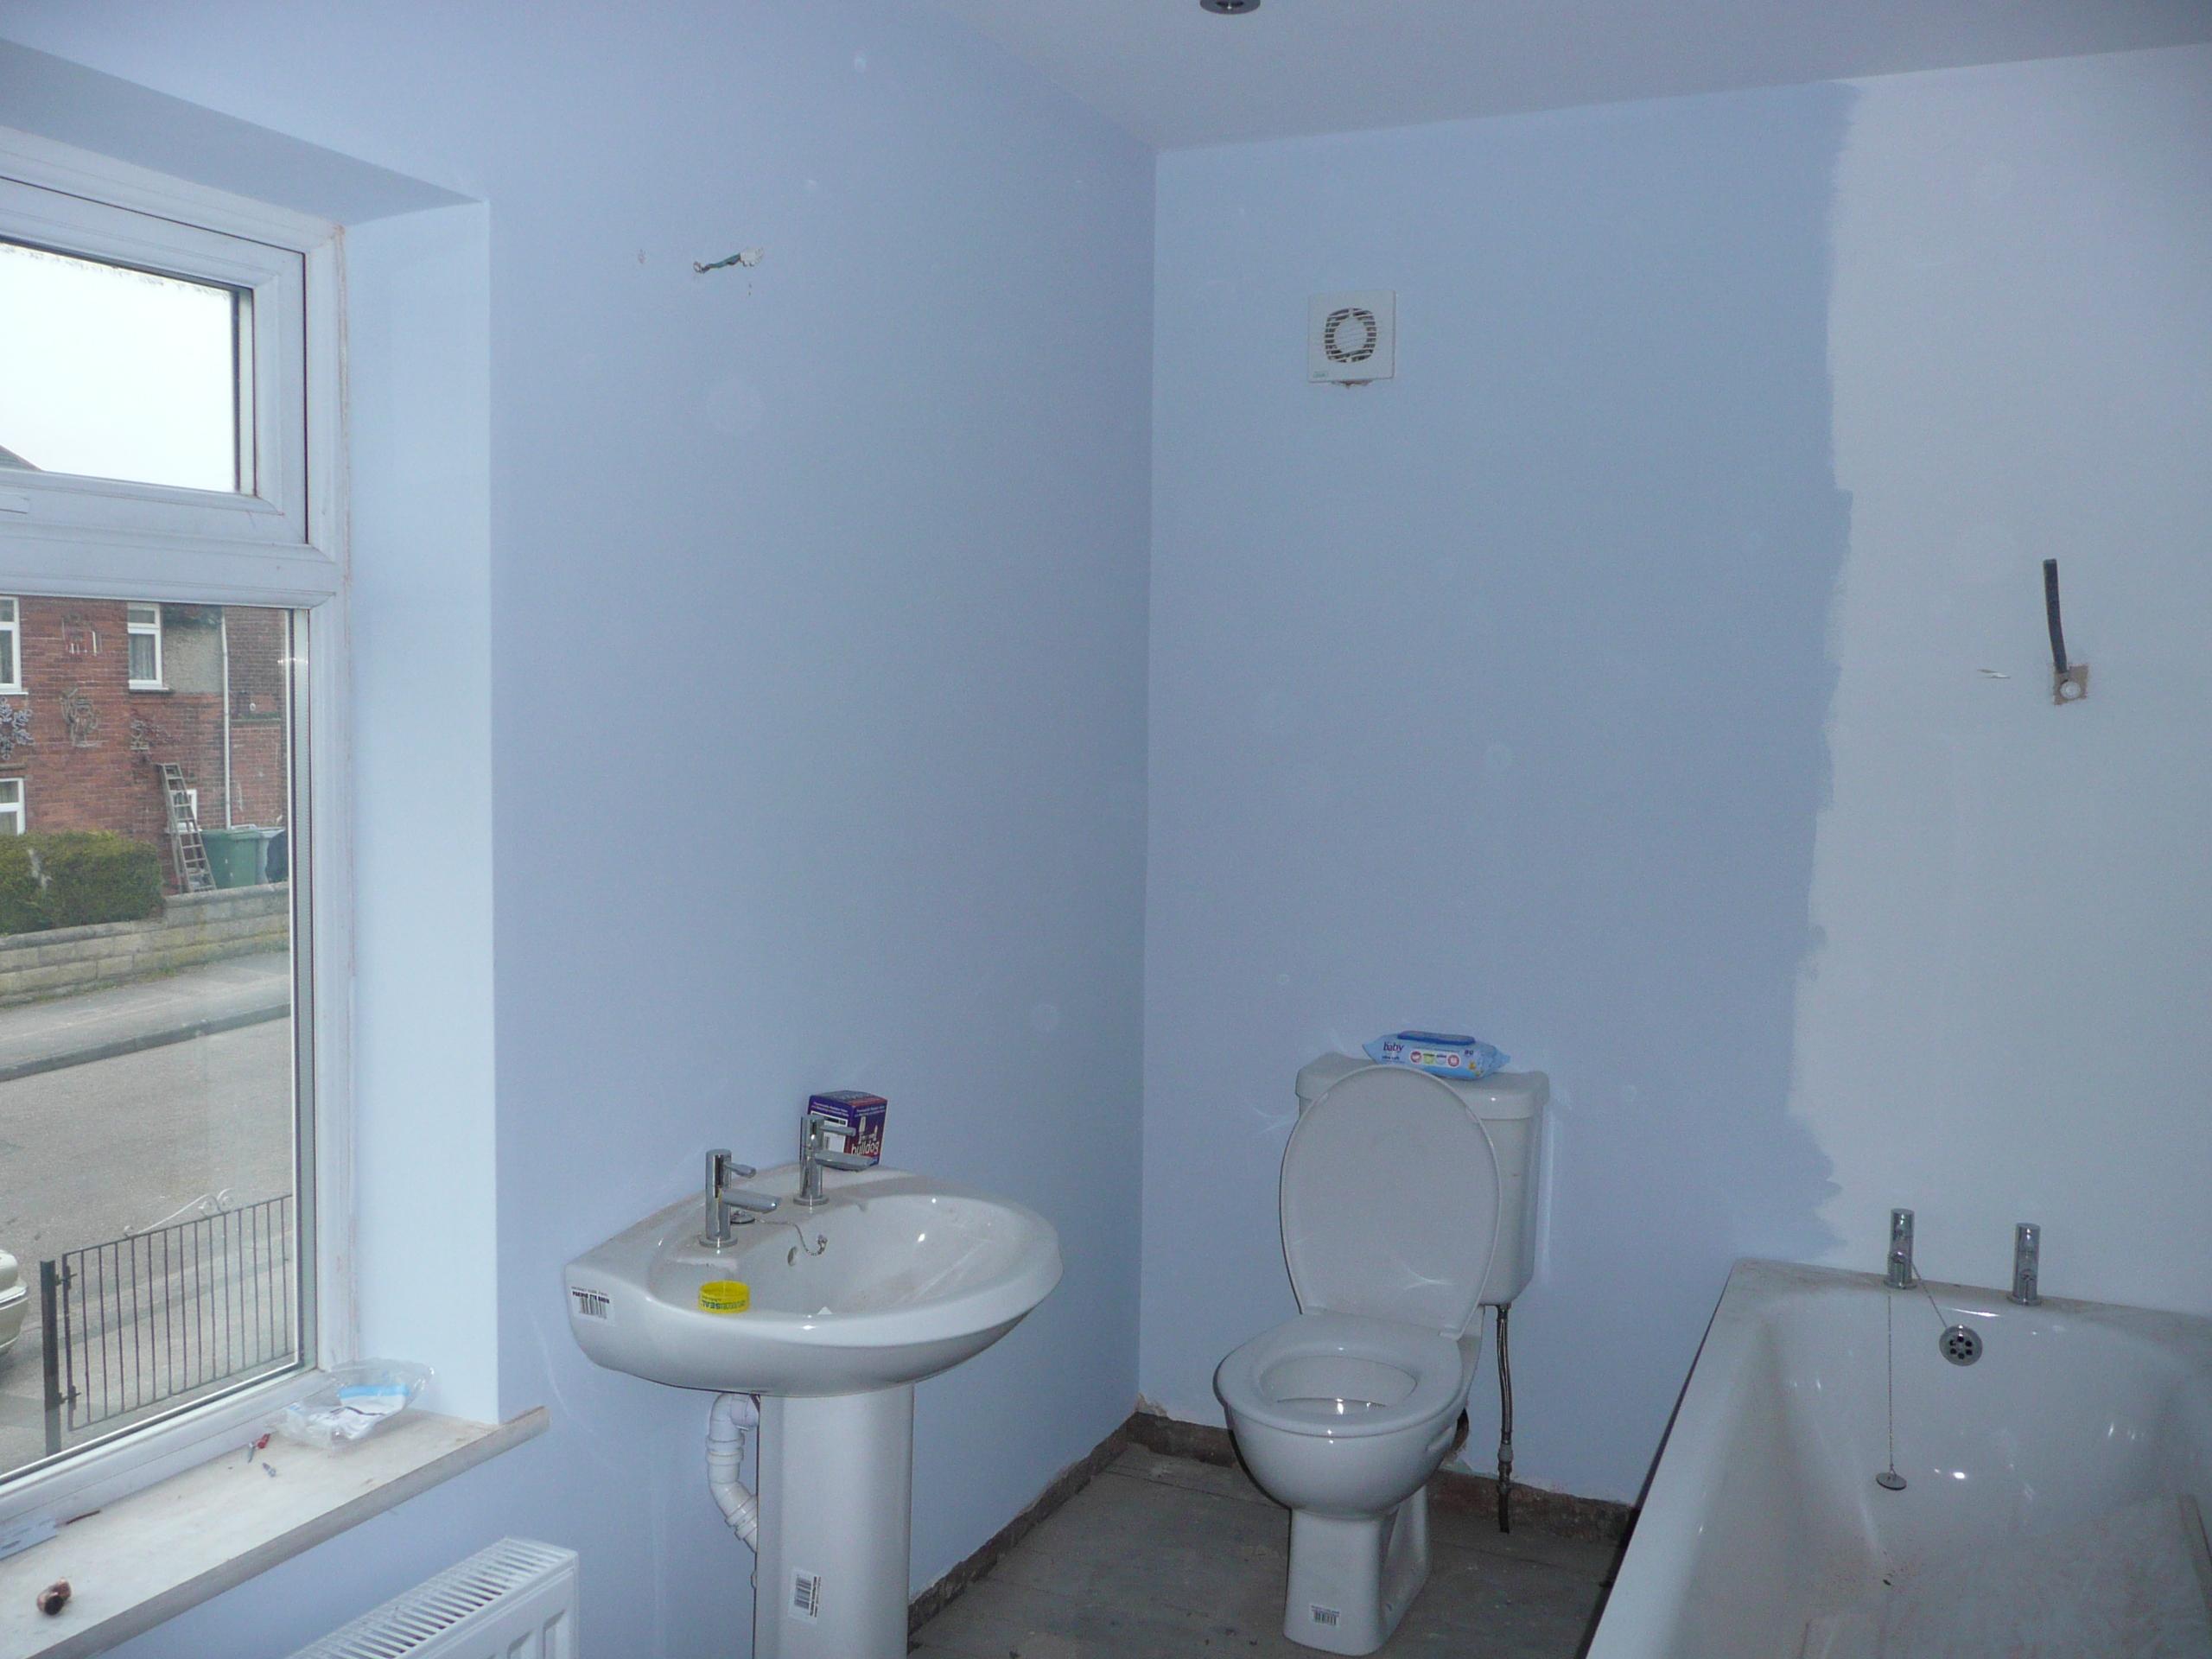 Example of new bathroom